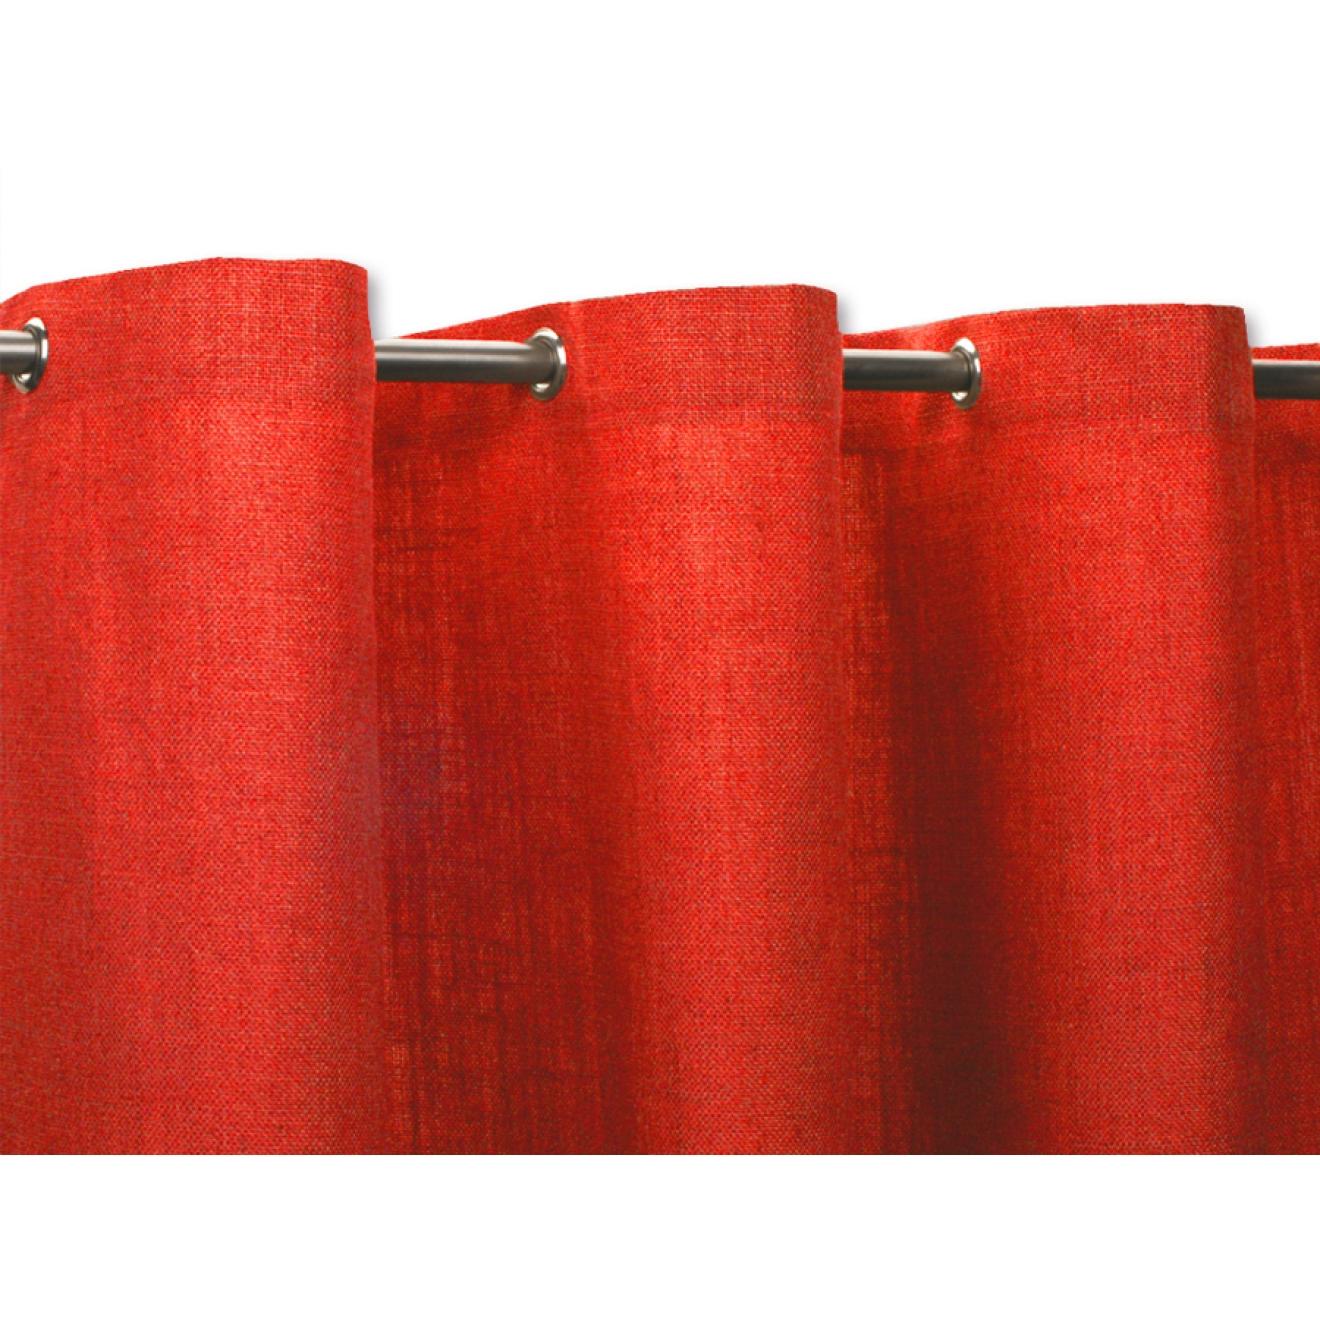 textil duschvorhang leinen baumwolle rot in vielen gr en. Black Bedroom Furniture Sets. Home Design Ideas